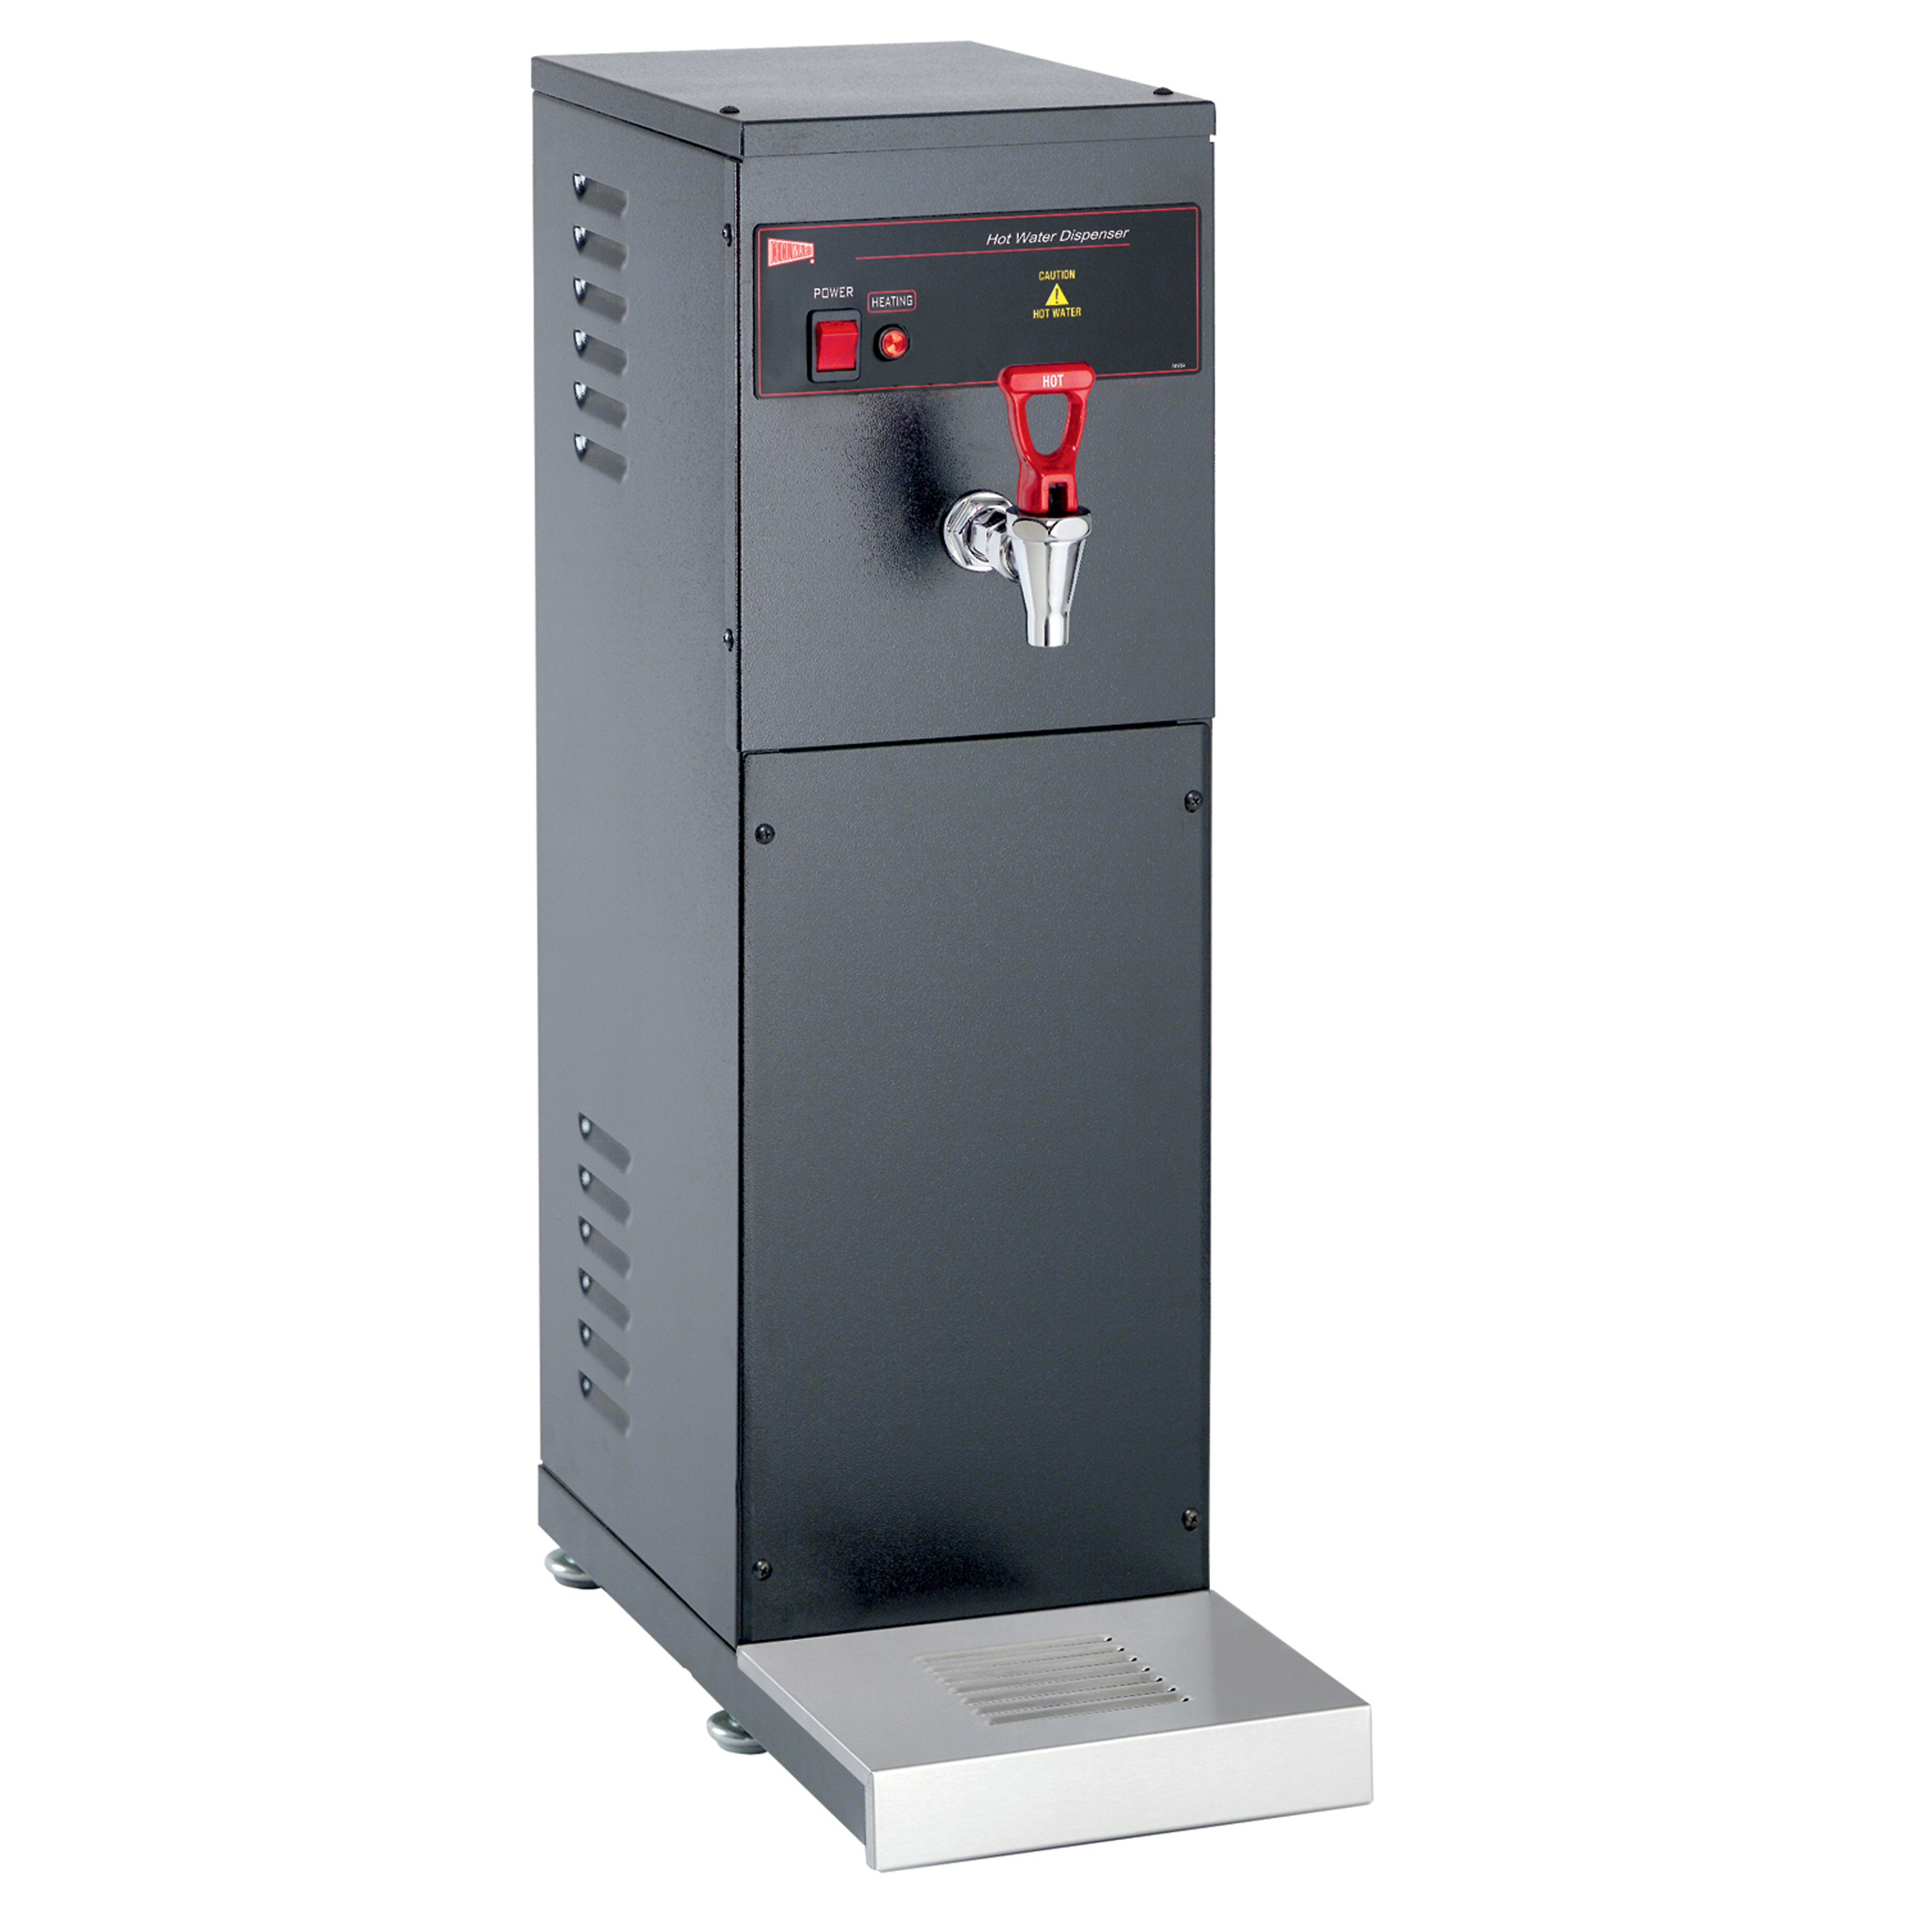 Grindmaster-Cecilware HWD5-2401008 hot water dispenser